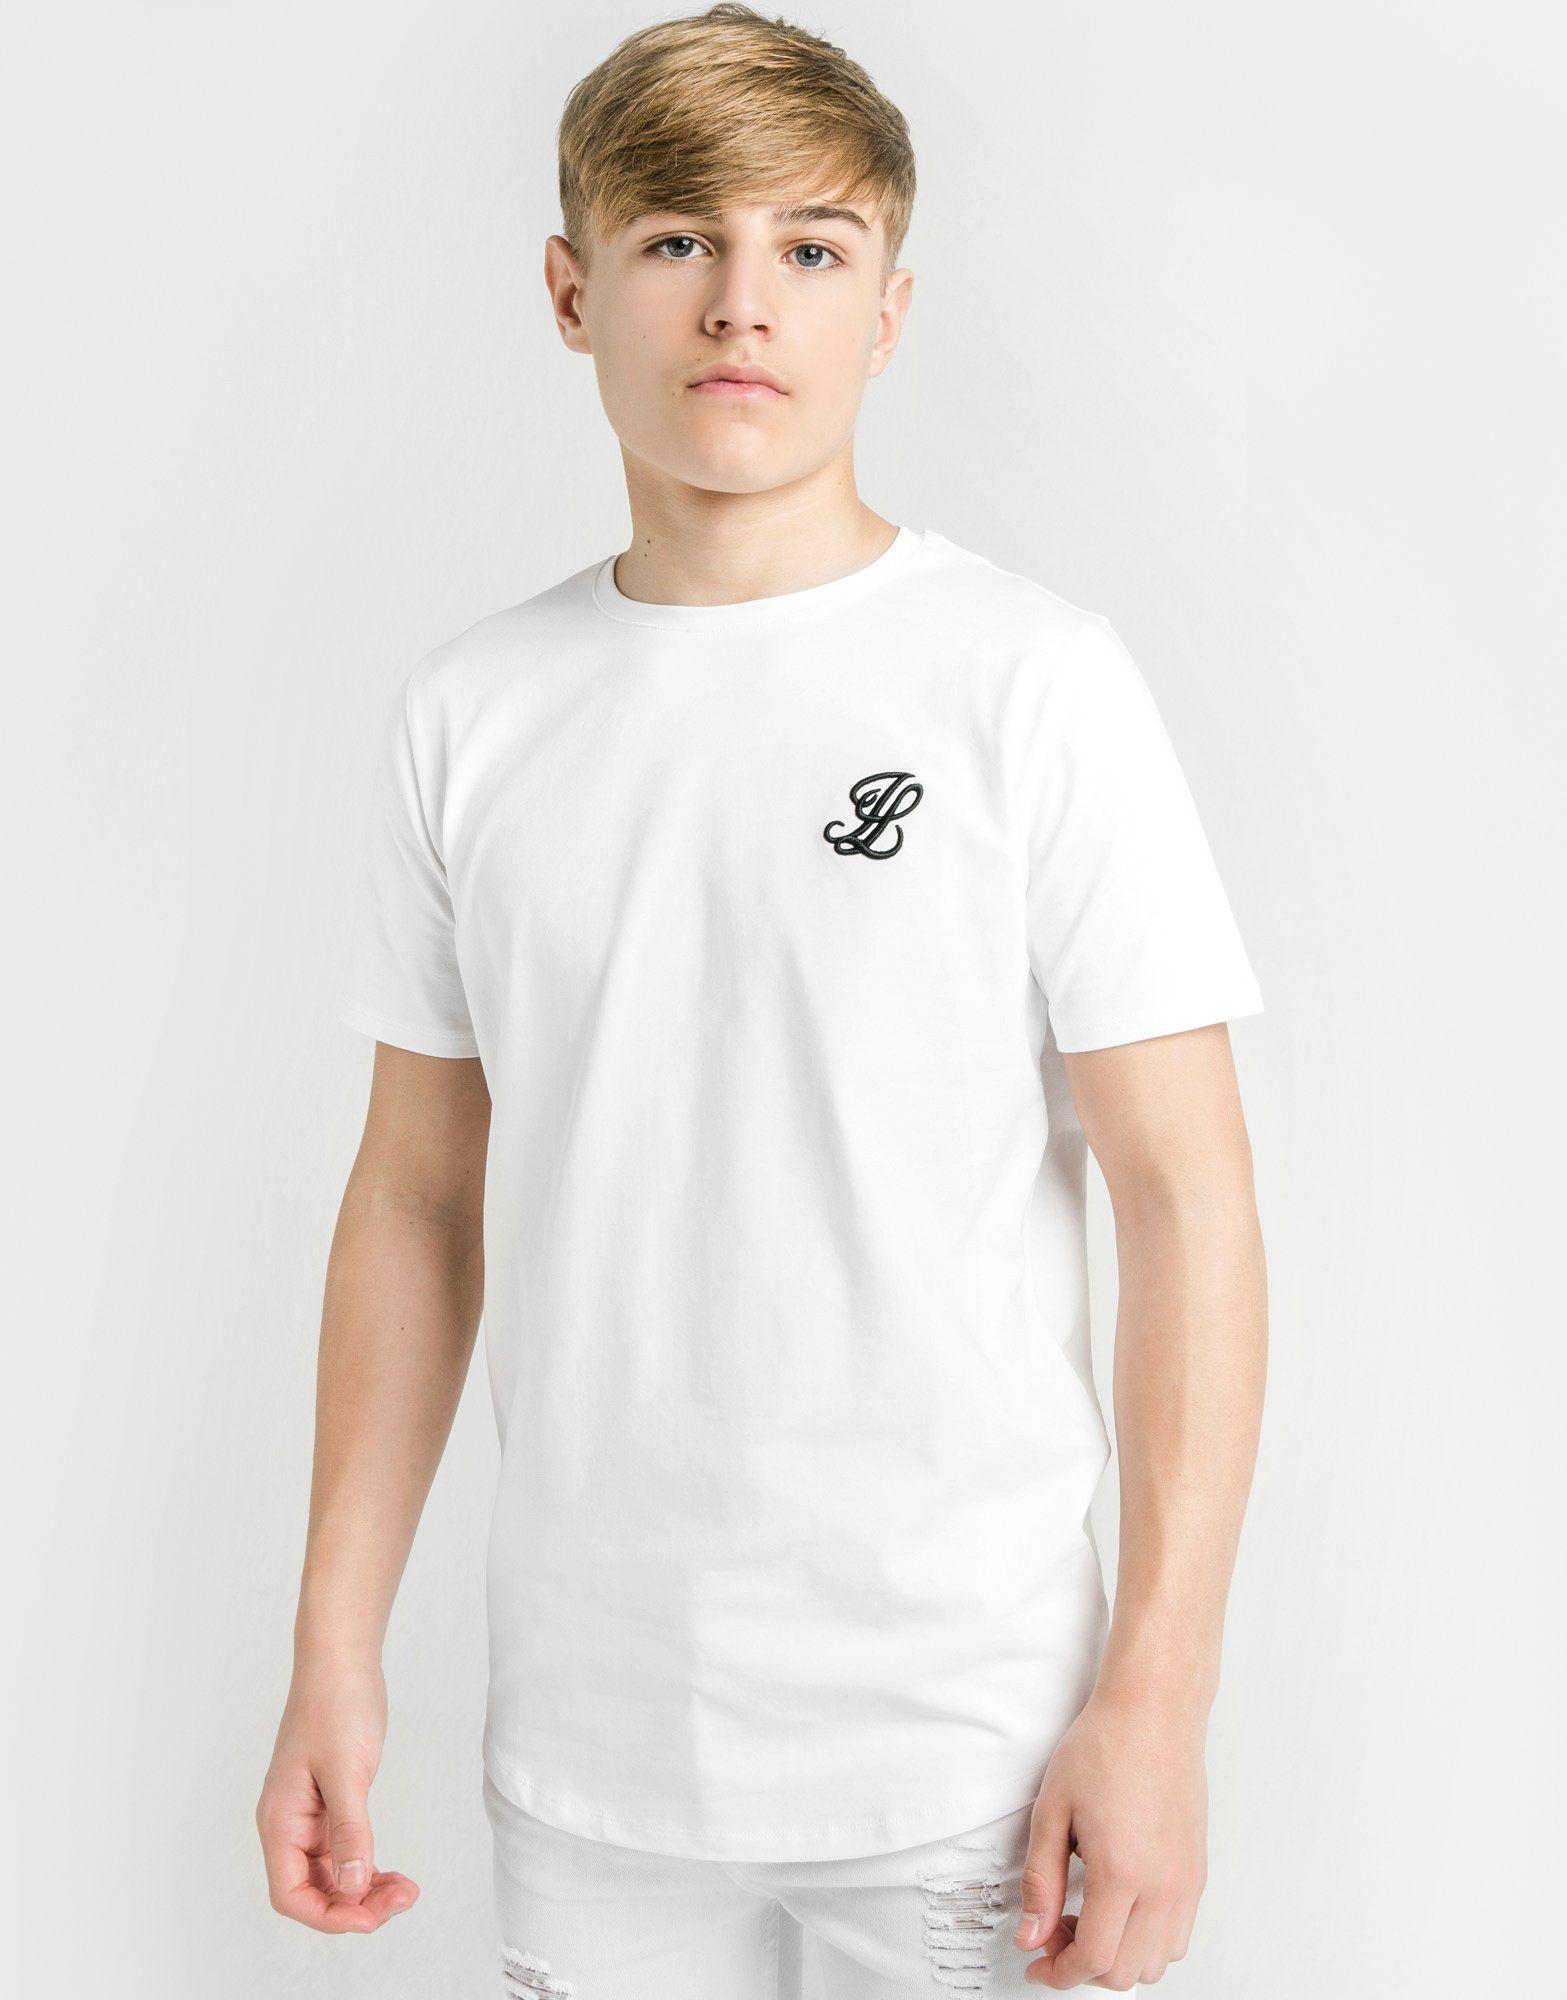 Core T JuniorJd Sports Illusive London Shirt 6gybf7Yv